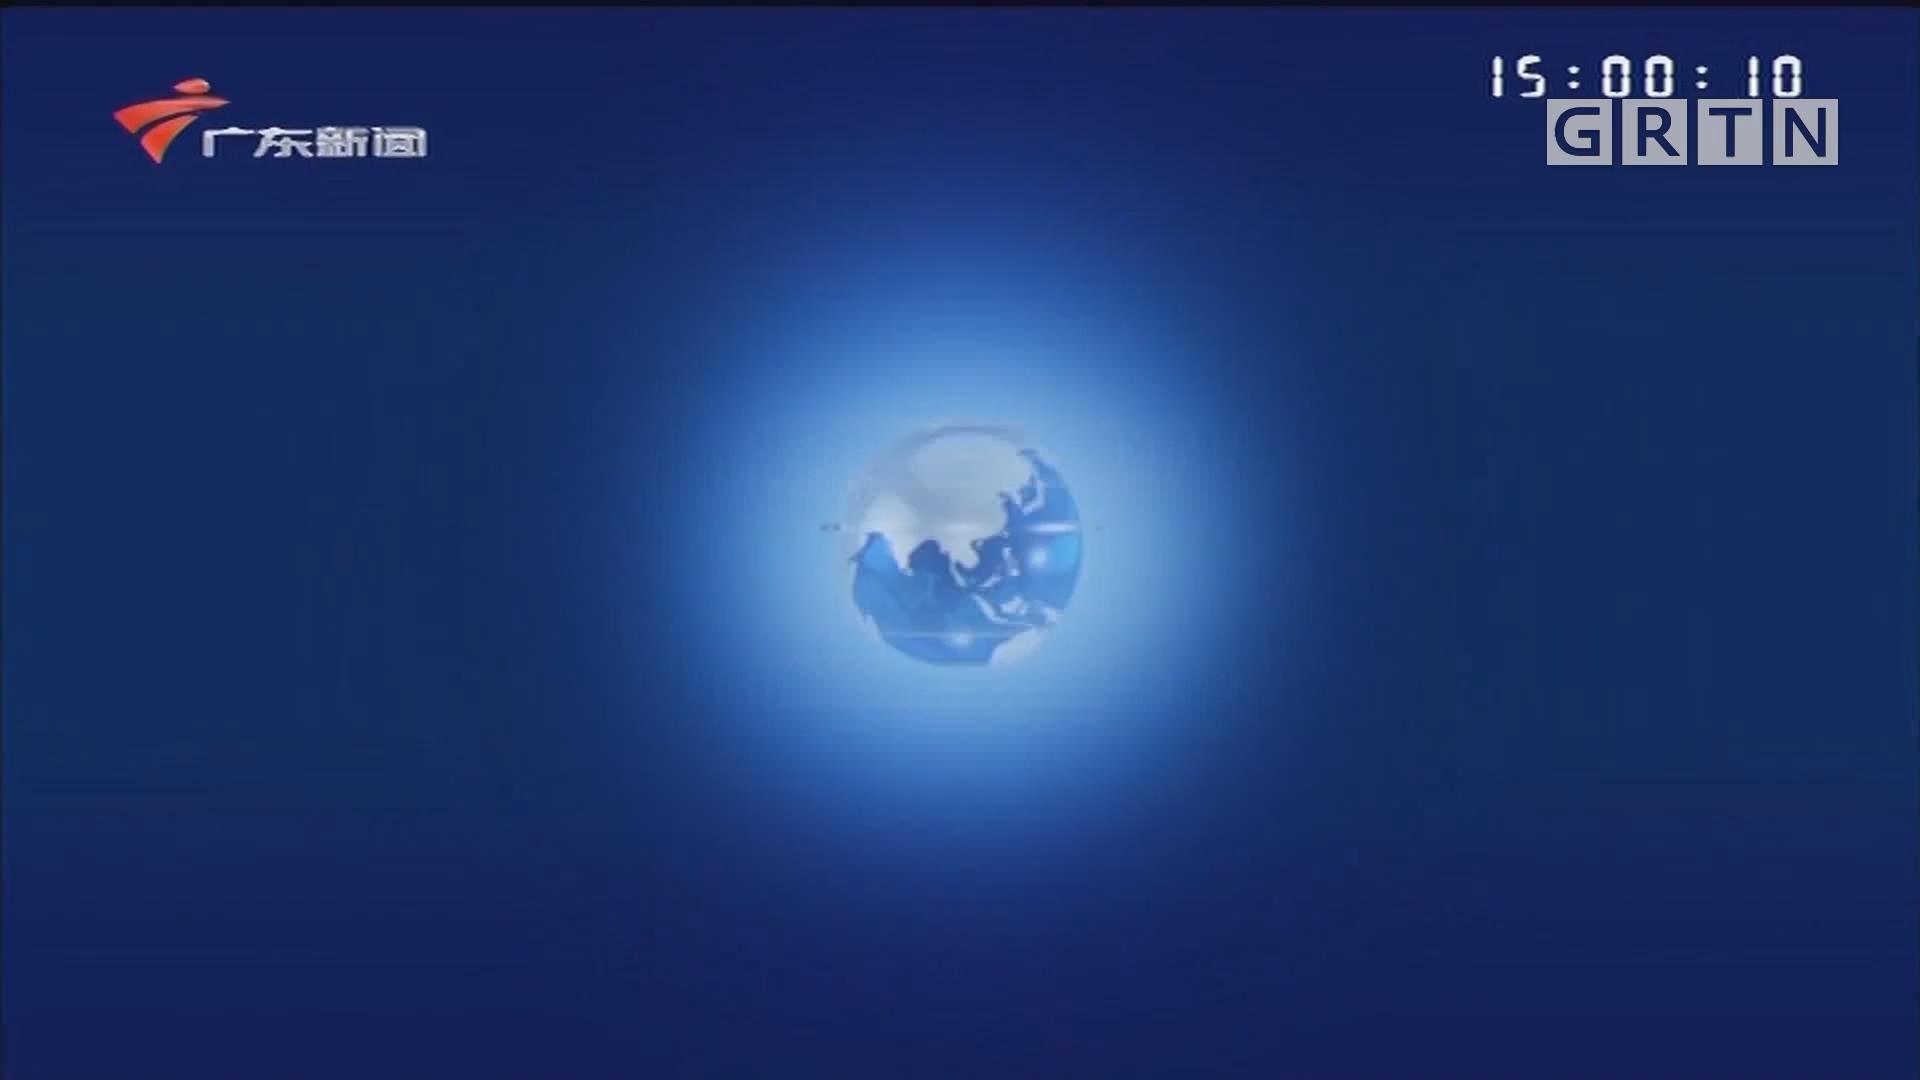 [HD][2020-02-24-15:00]正点播报:国家发改委:煤电油气供应总体充足